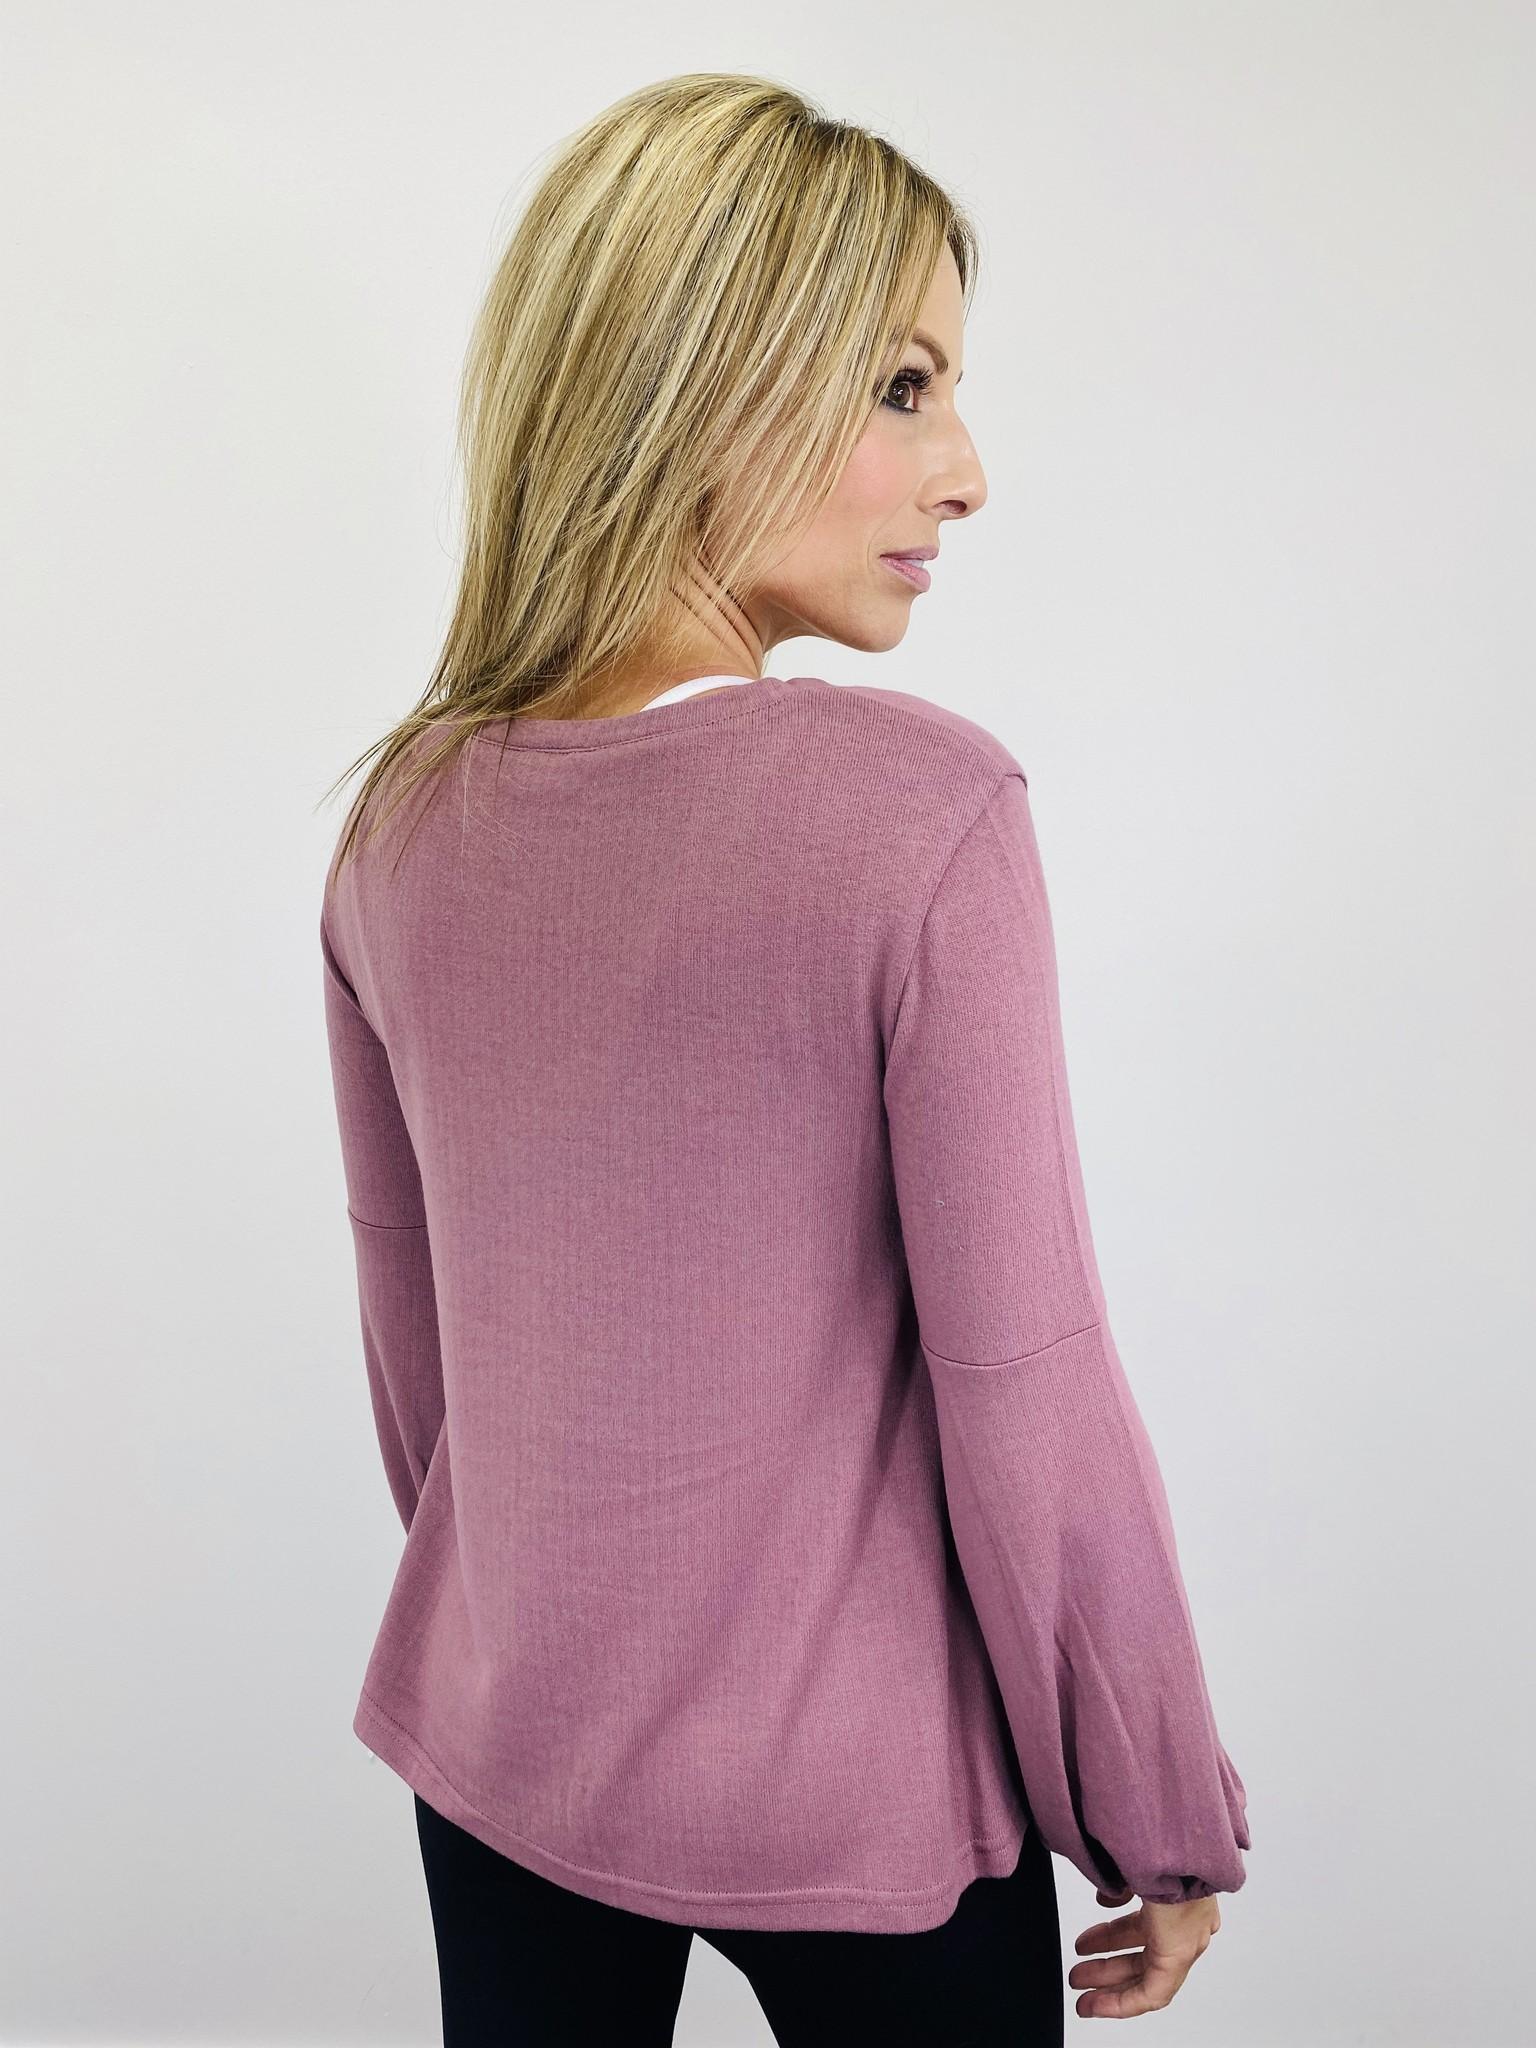 Jack by BB Dakota Rose Mauve Sweater